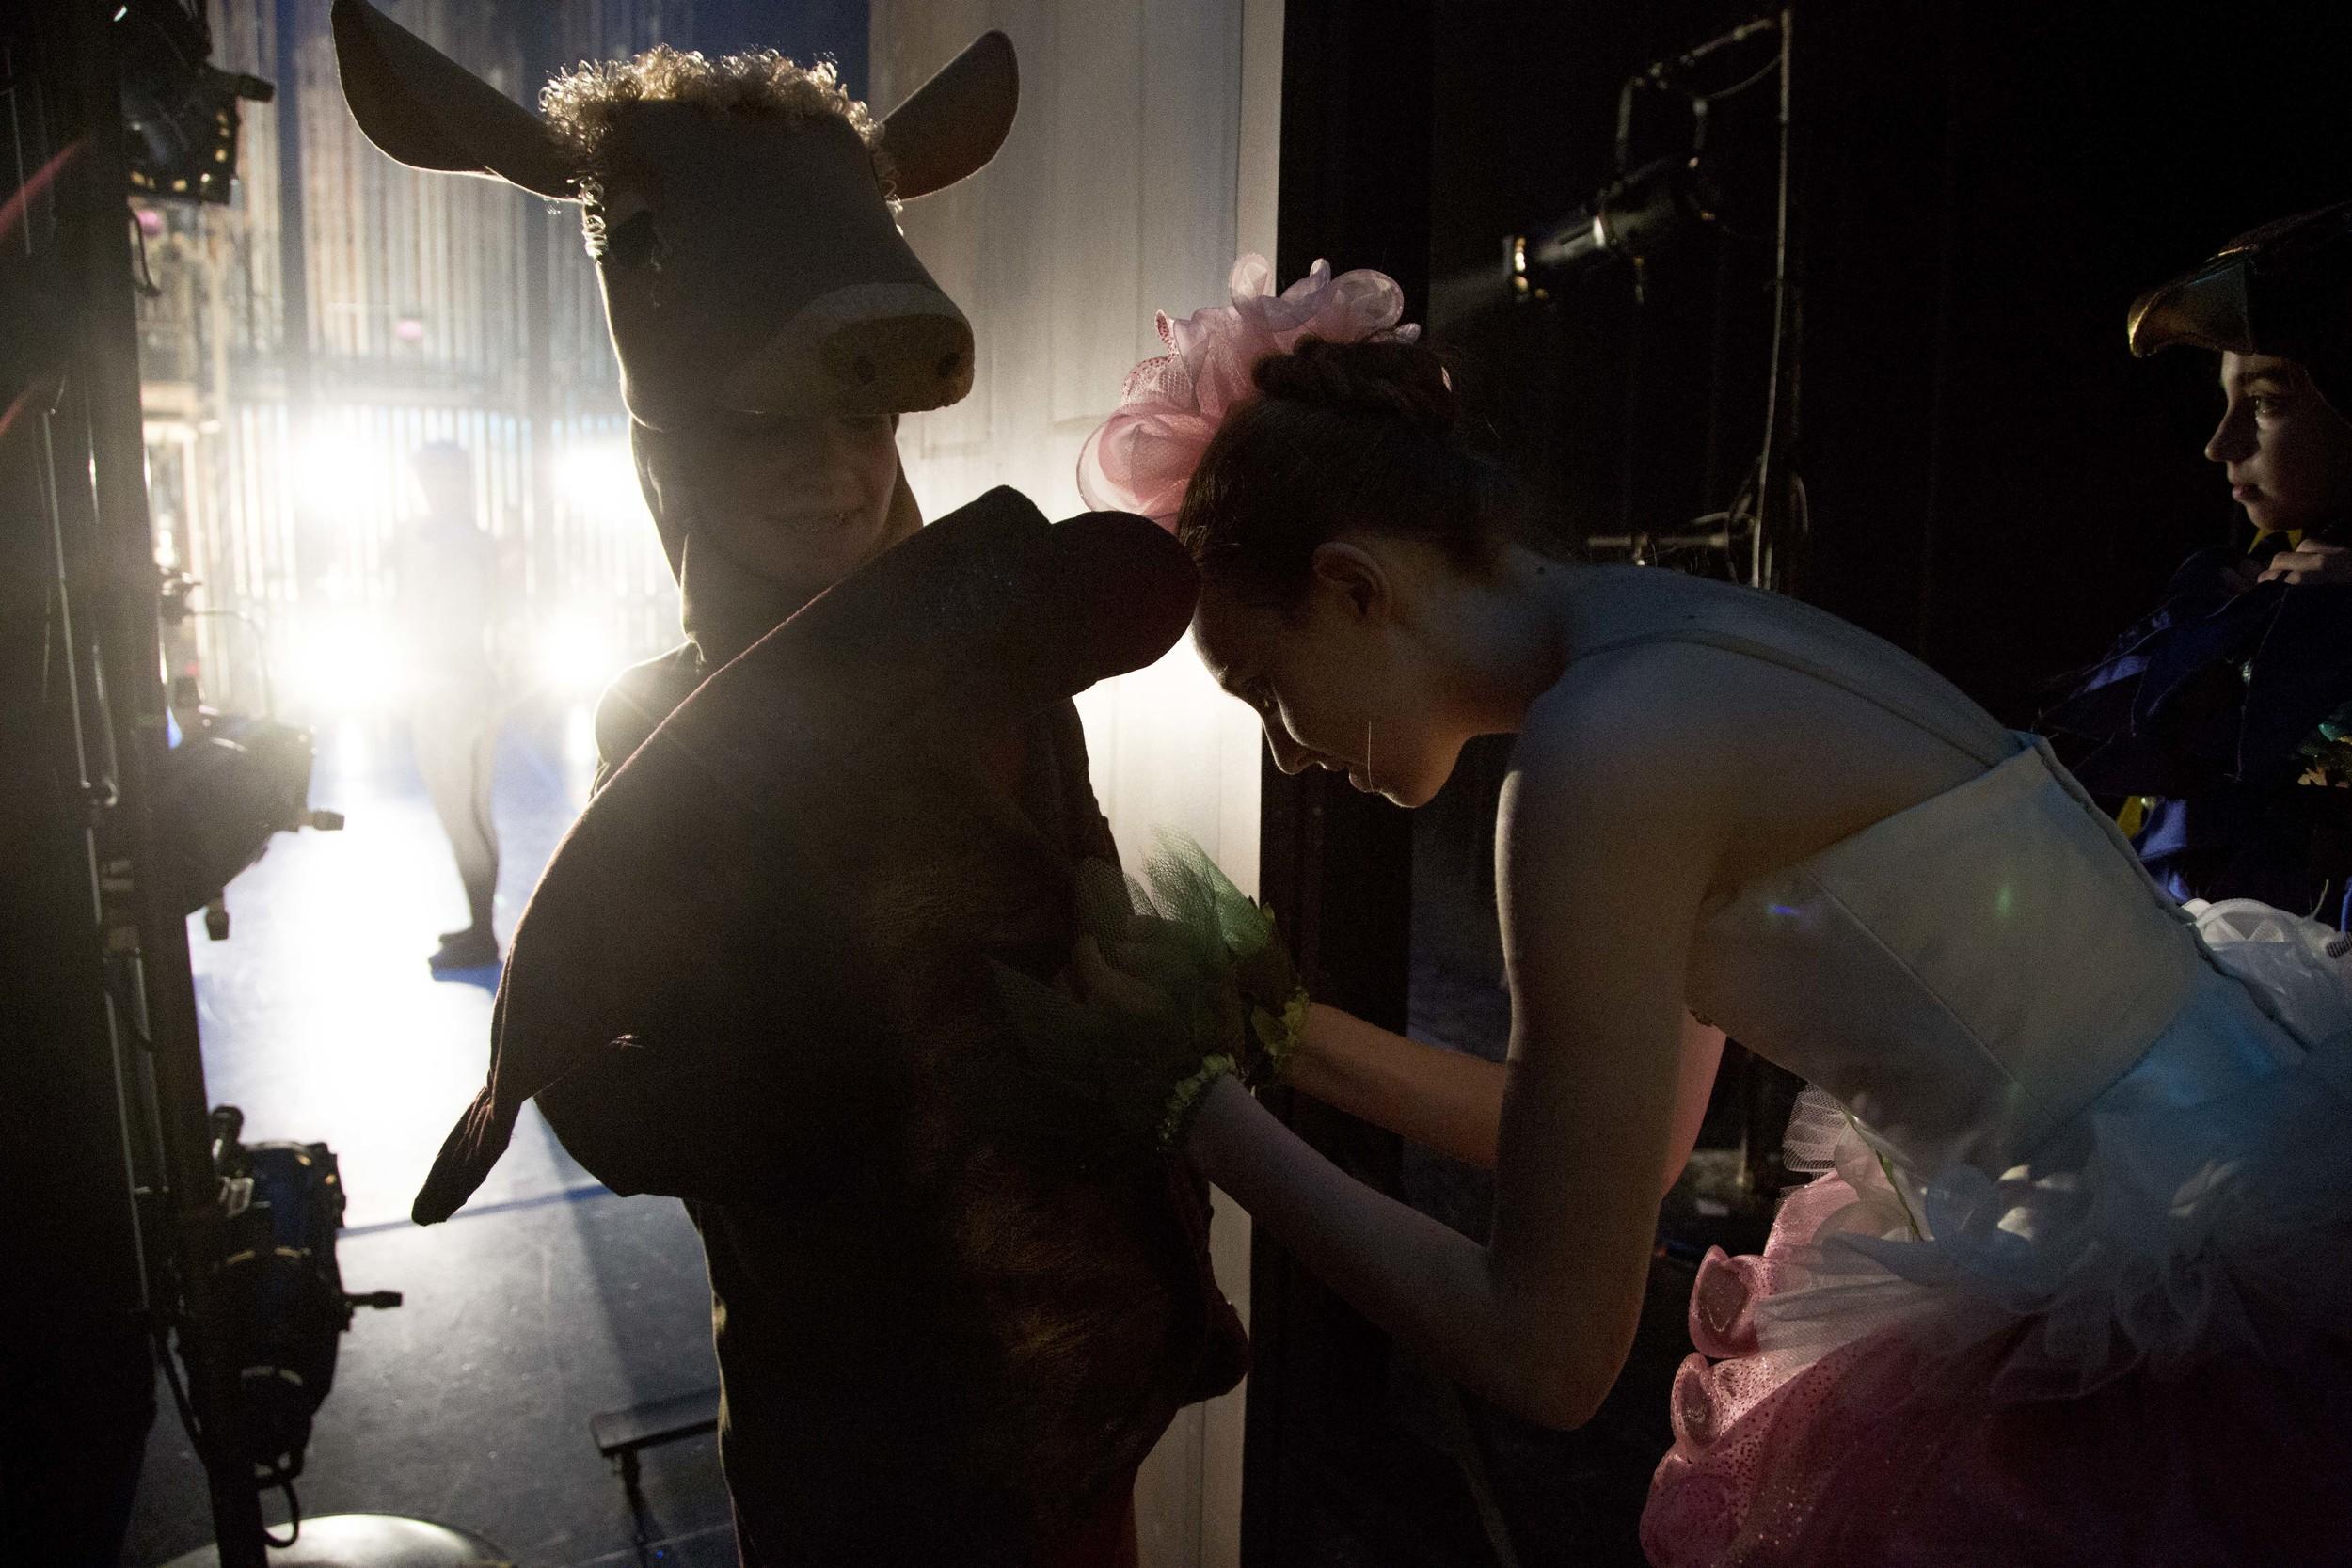 20150406-vn-ballet-ss-301.JPG